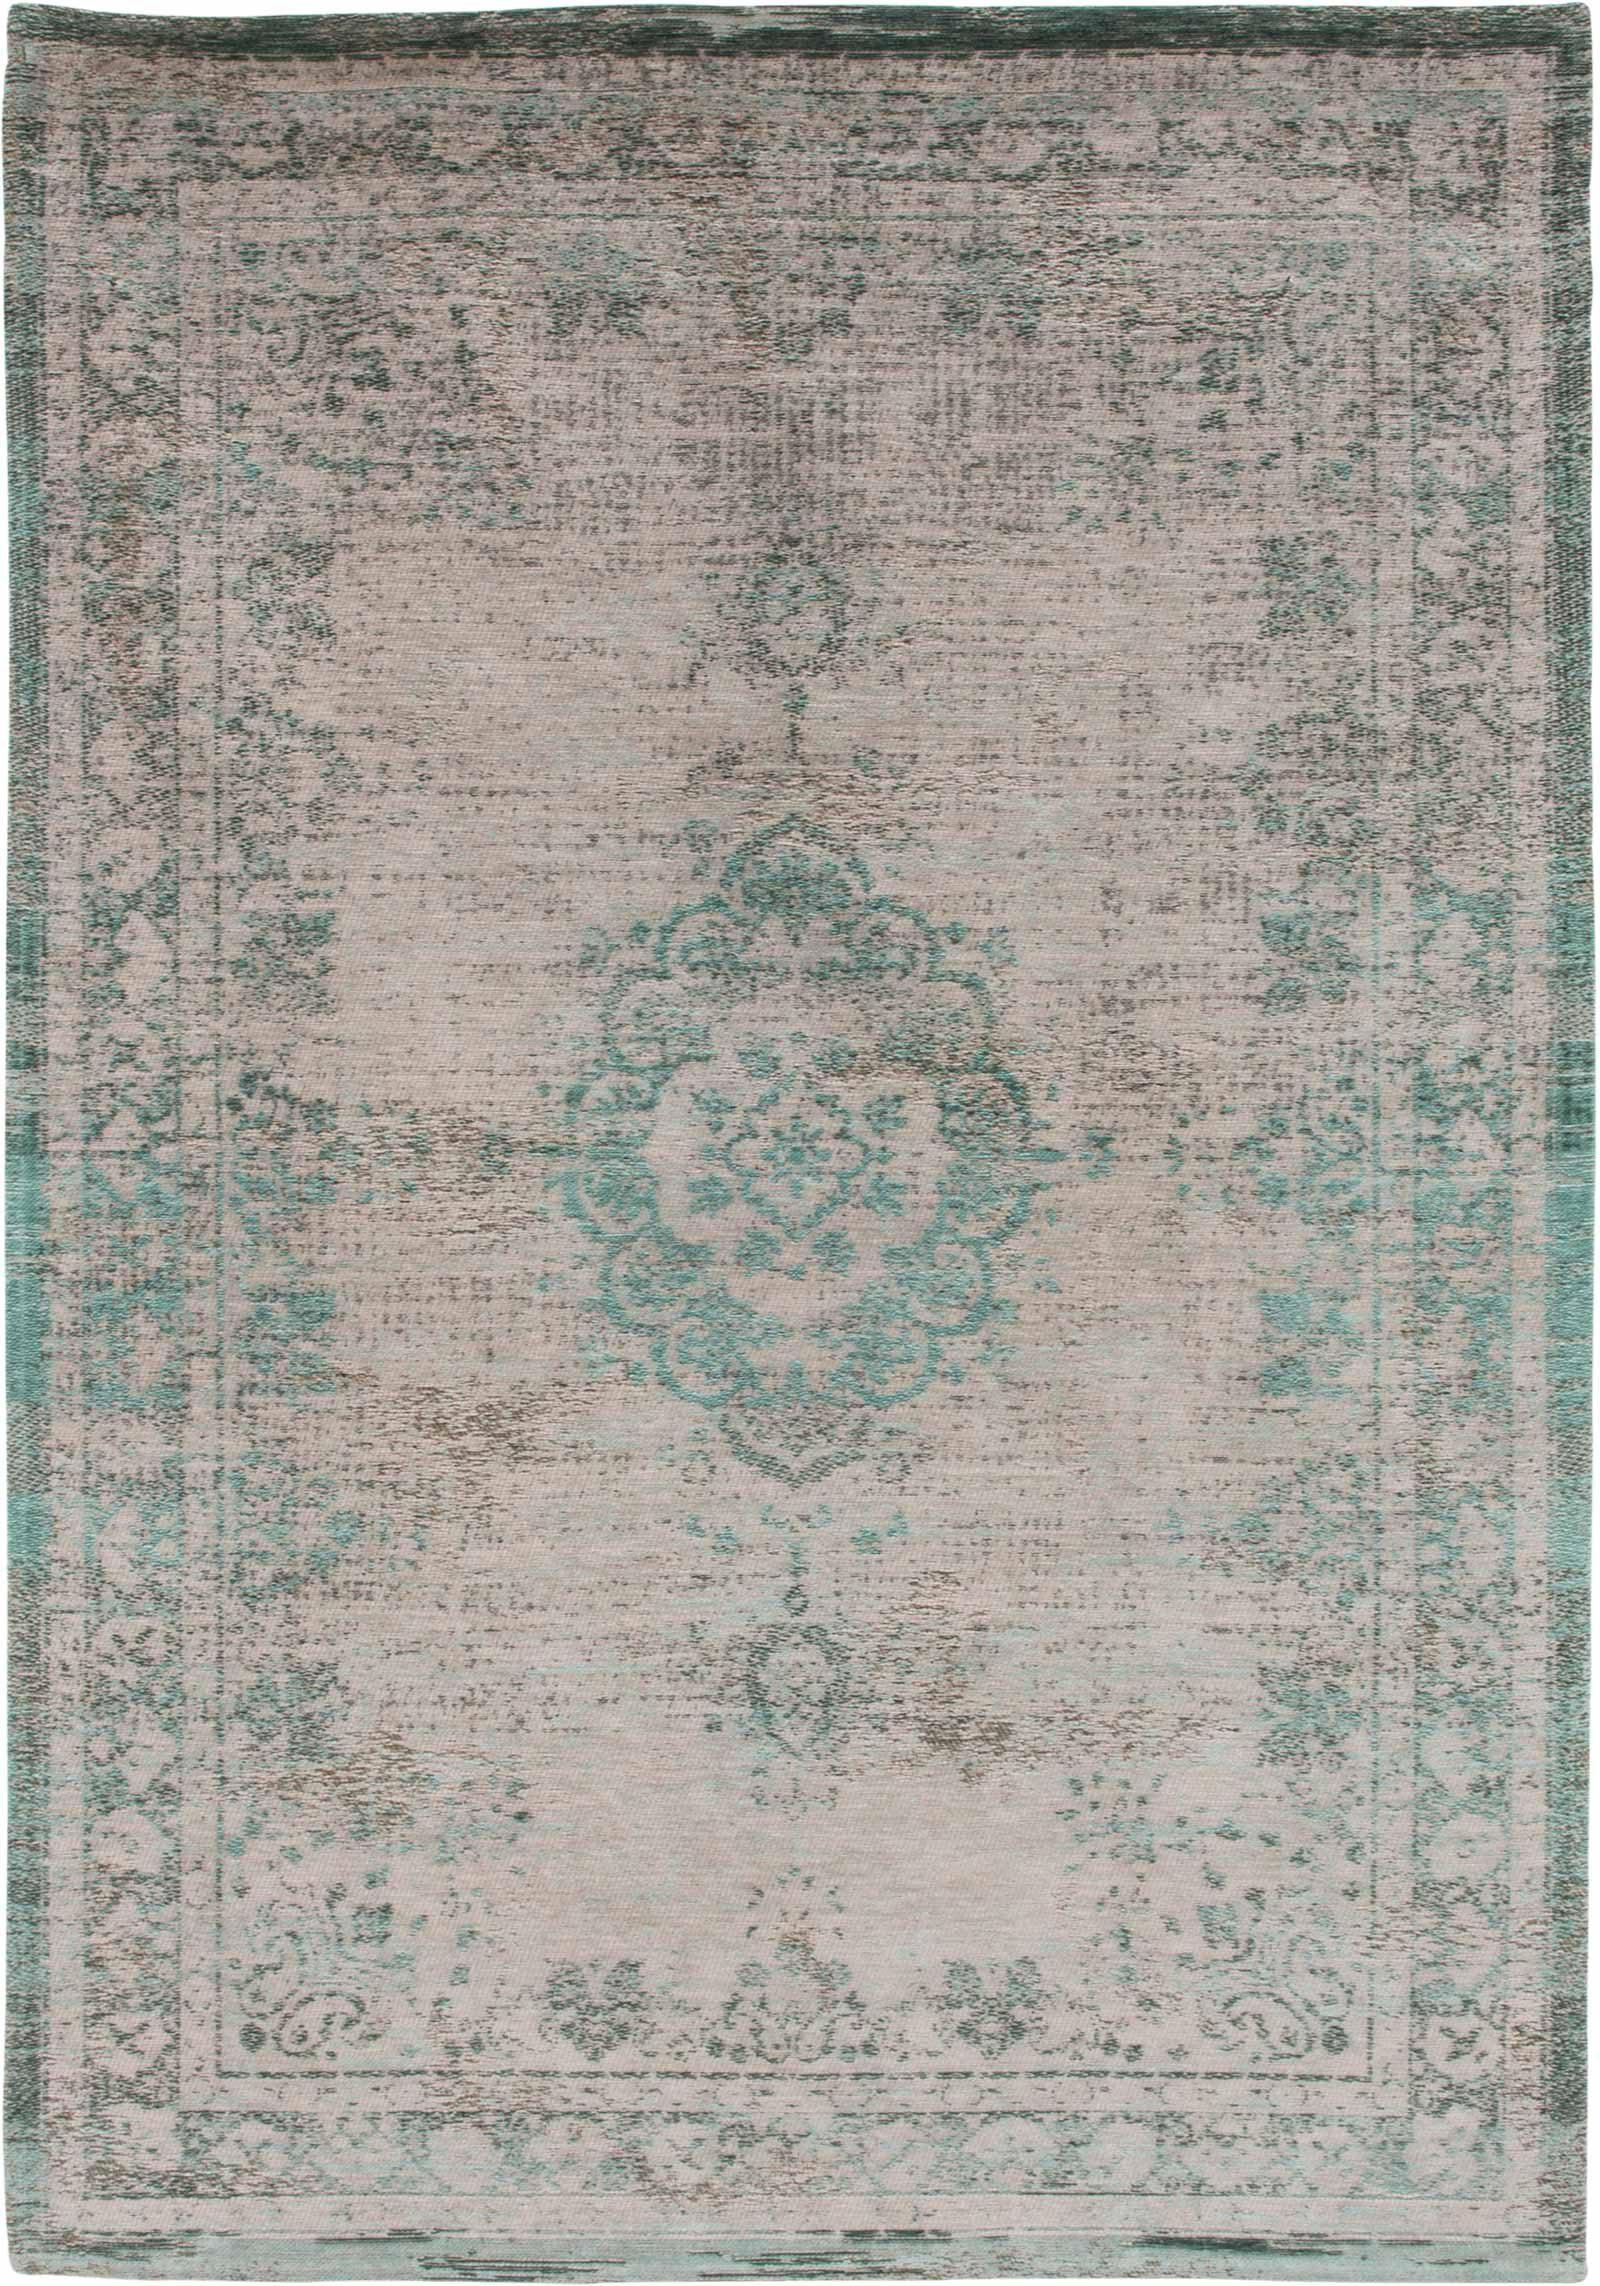 rug Louis De Poortere LX8259 Fading World Medaillon Jade Oyster